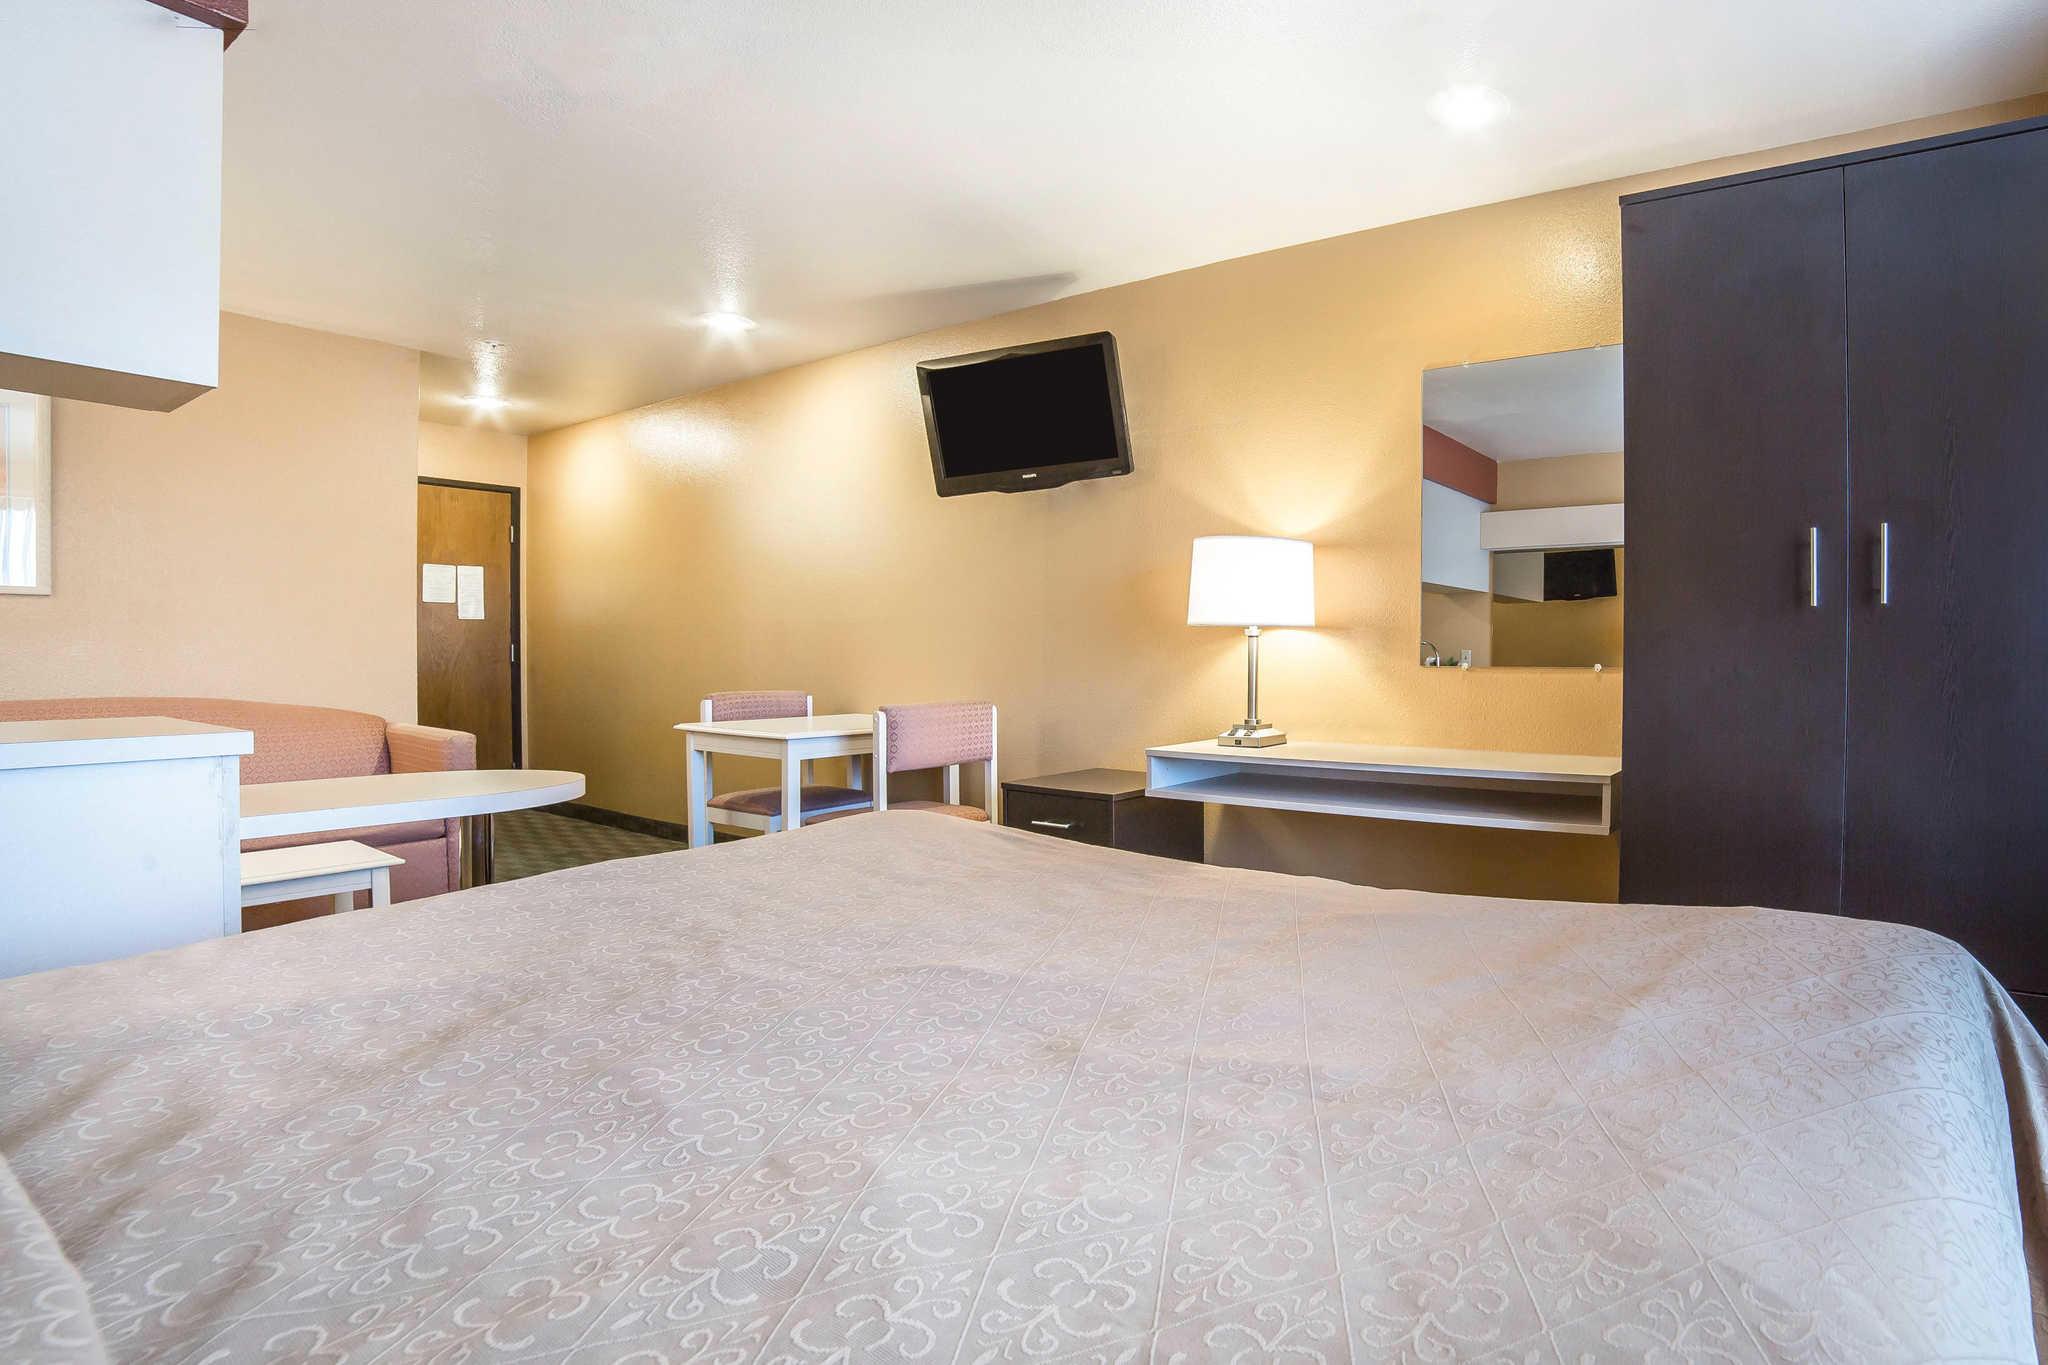 Quality Inn & Suites Elko image 19